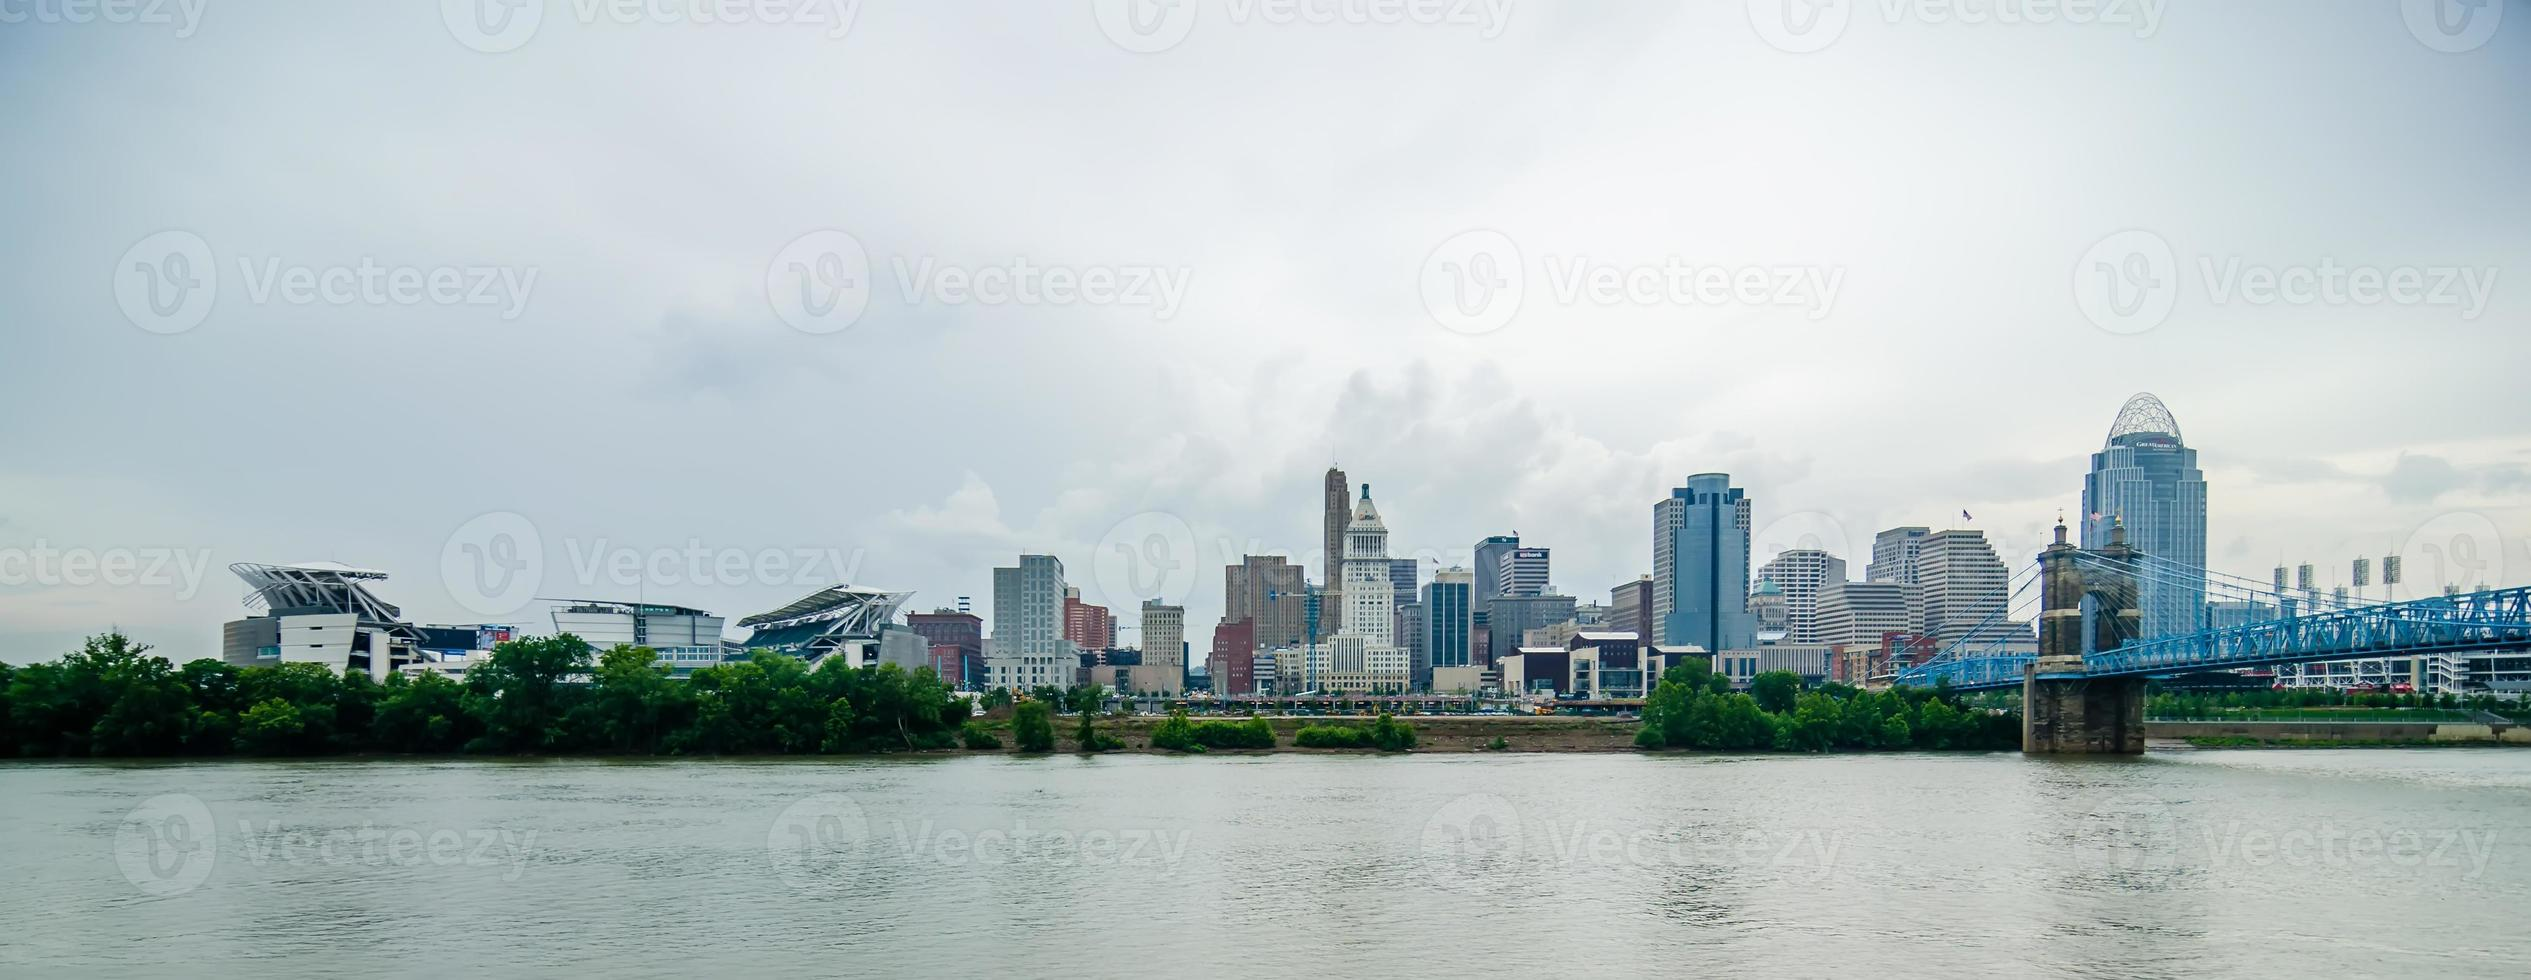 Cincinnati skyline and historic John A. Roebling suspension bridge photo